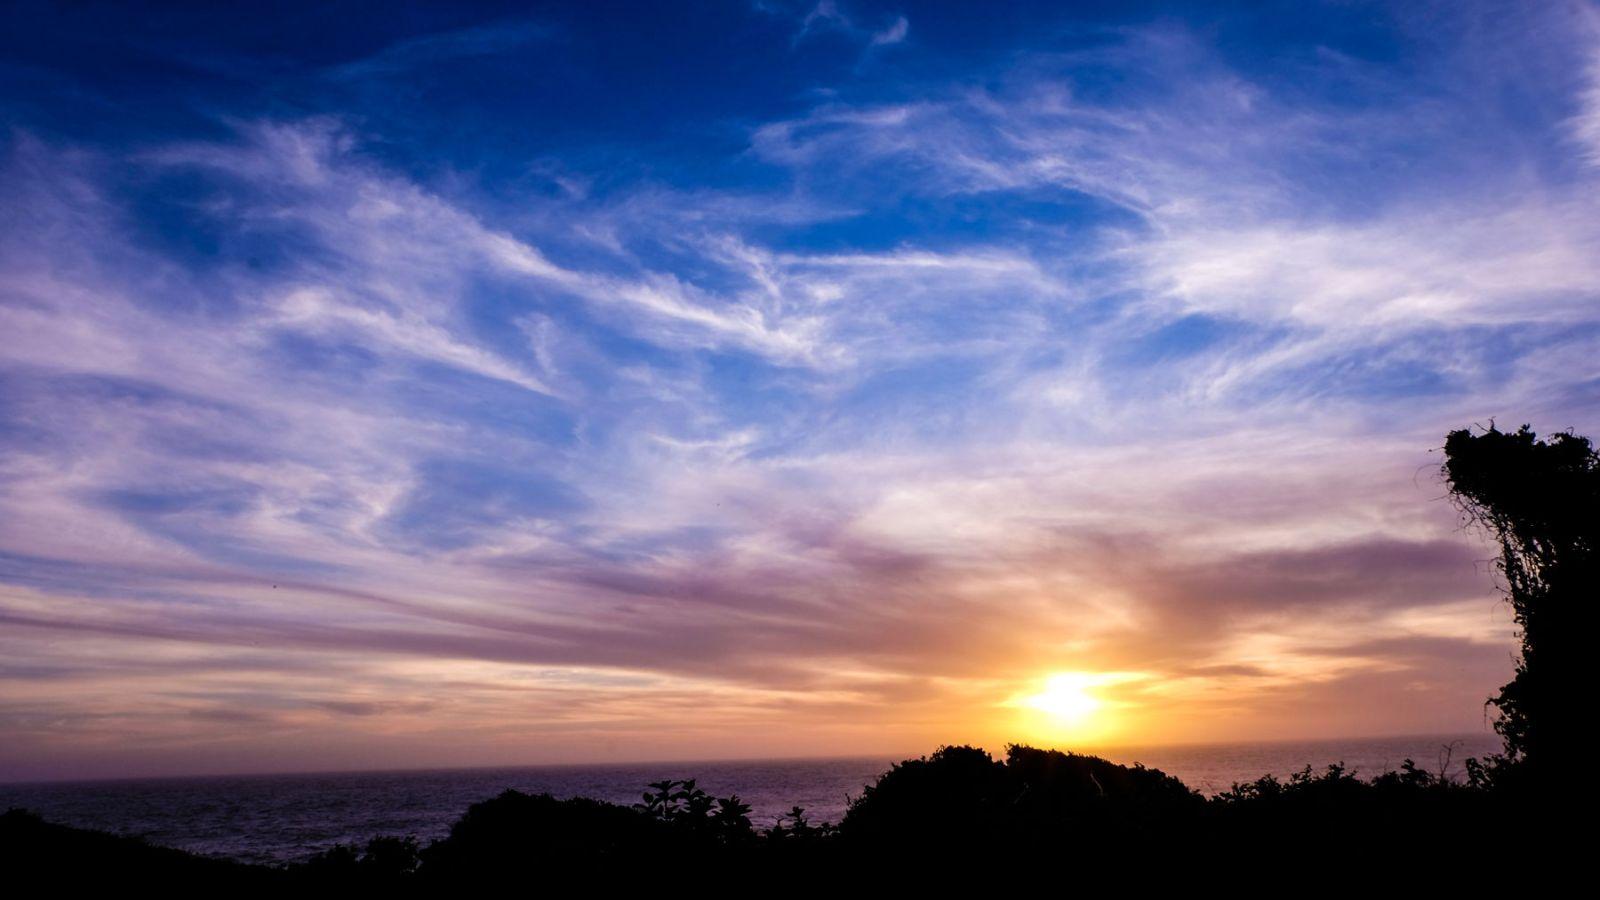 a photo of a sunrise on the coast along the otter trail.